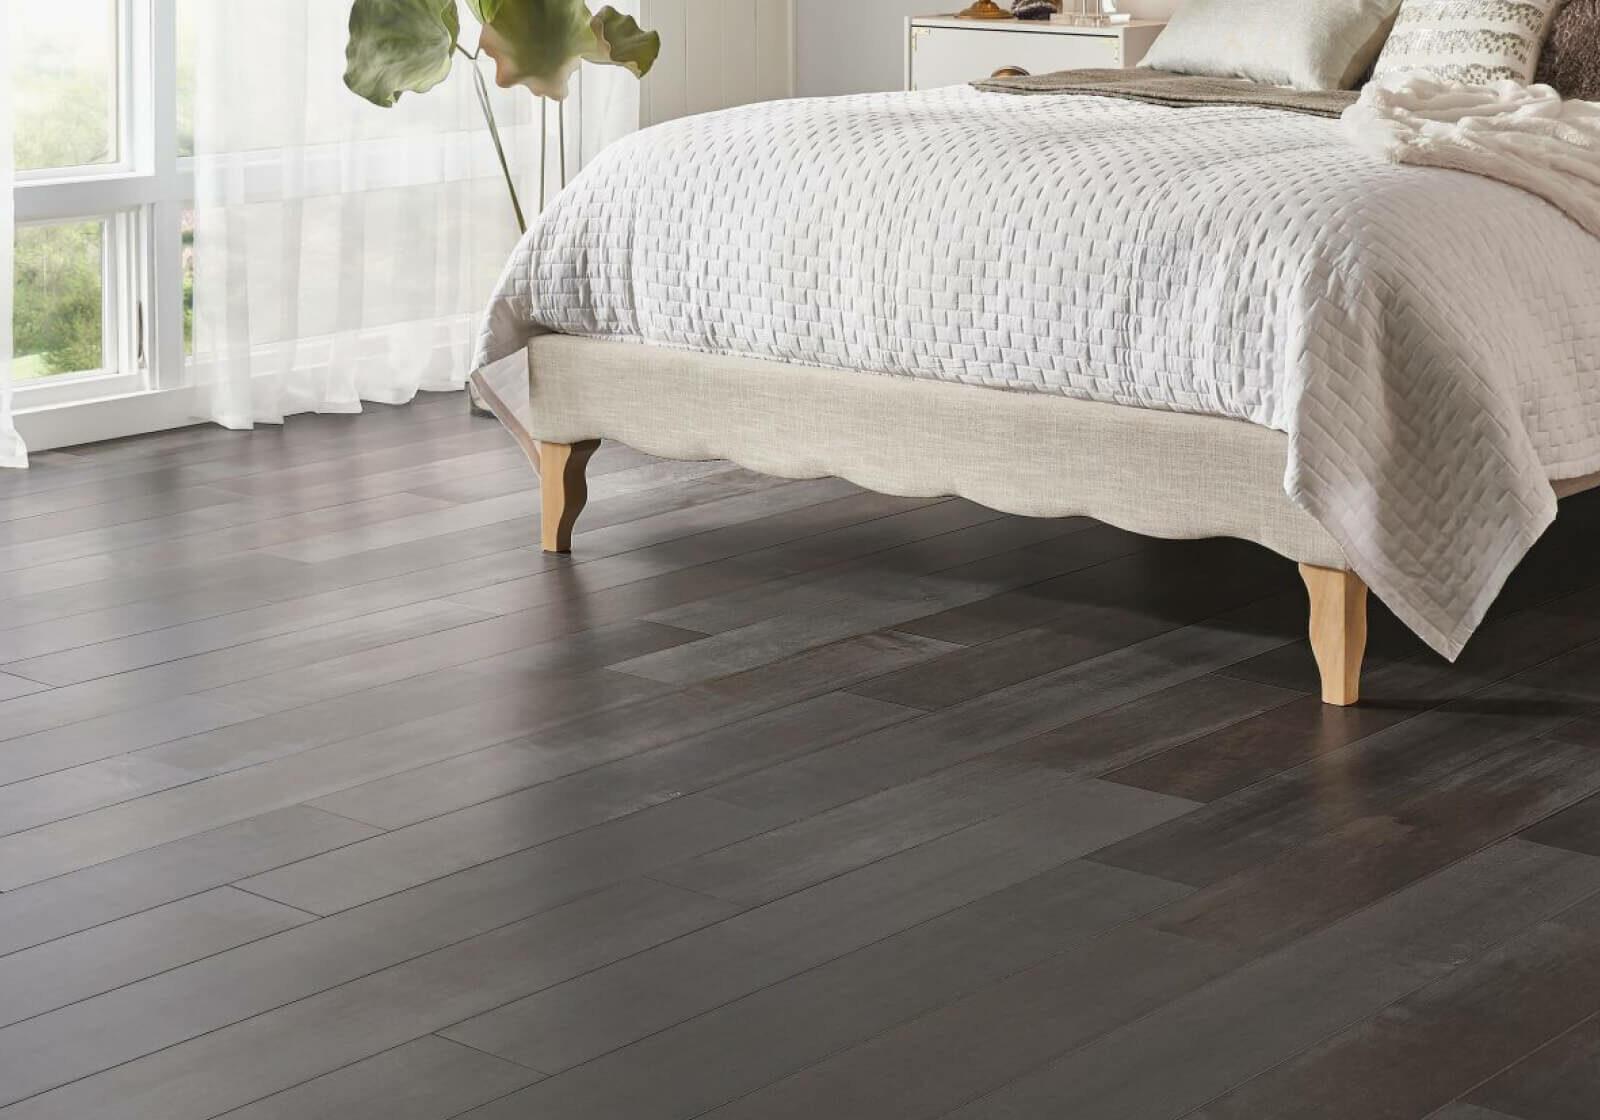 Hardwood Care & Maintenance | O'Krent Floors